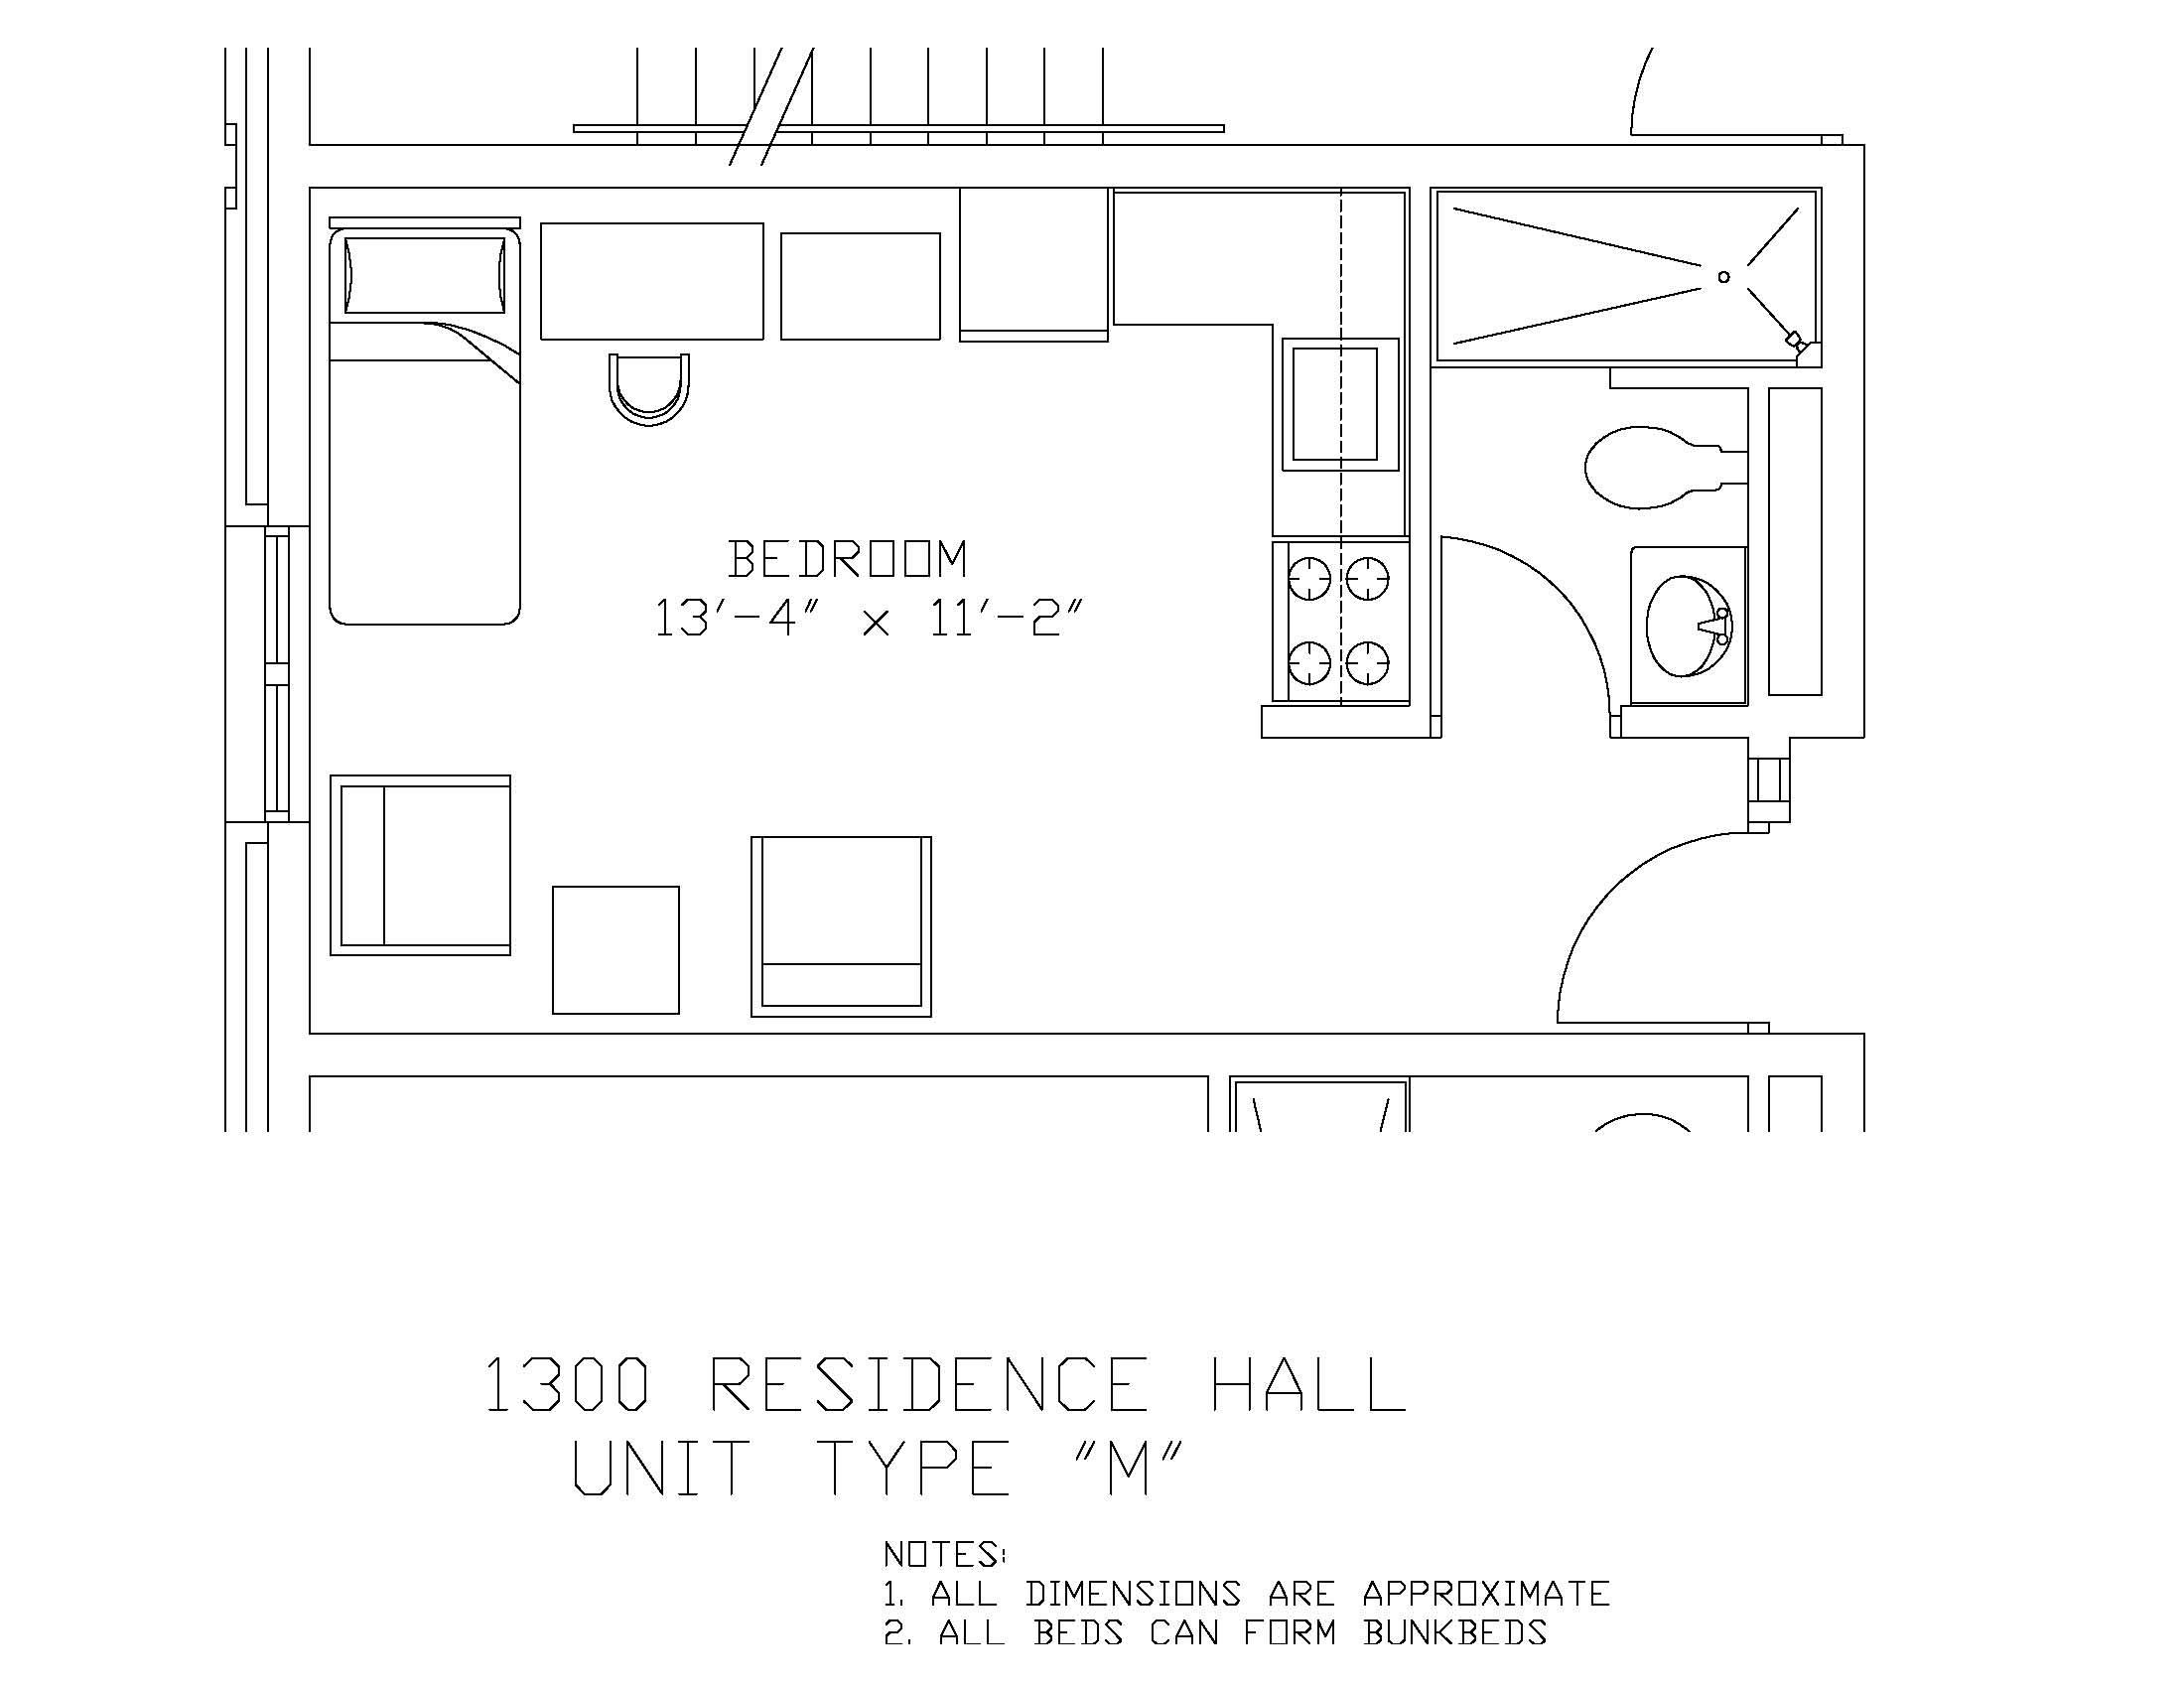 1300 Residence Hall: Type M